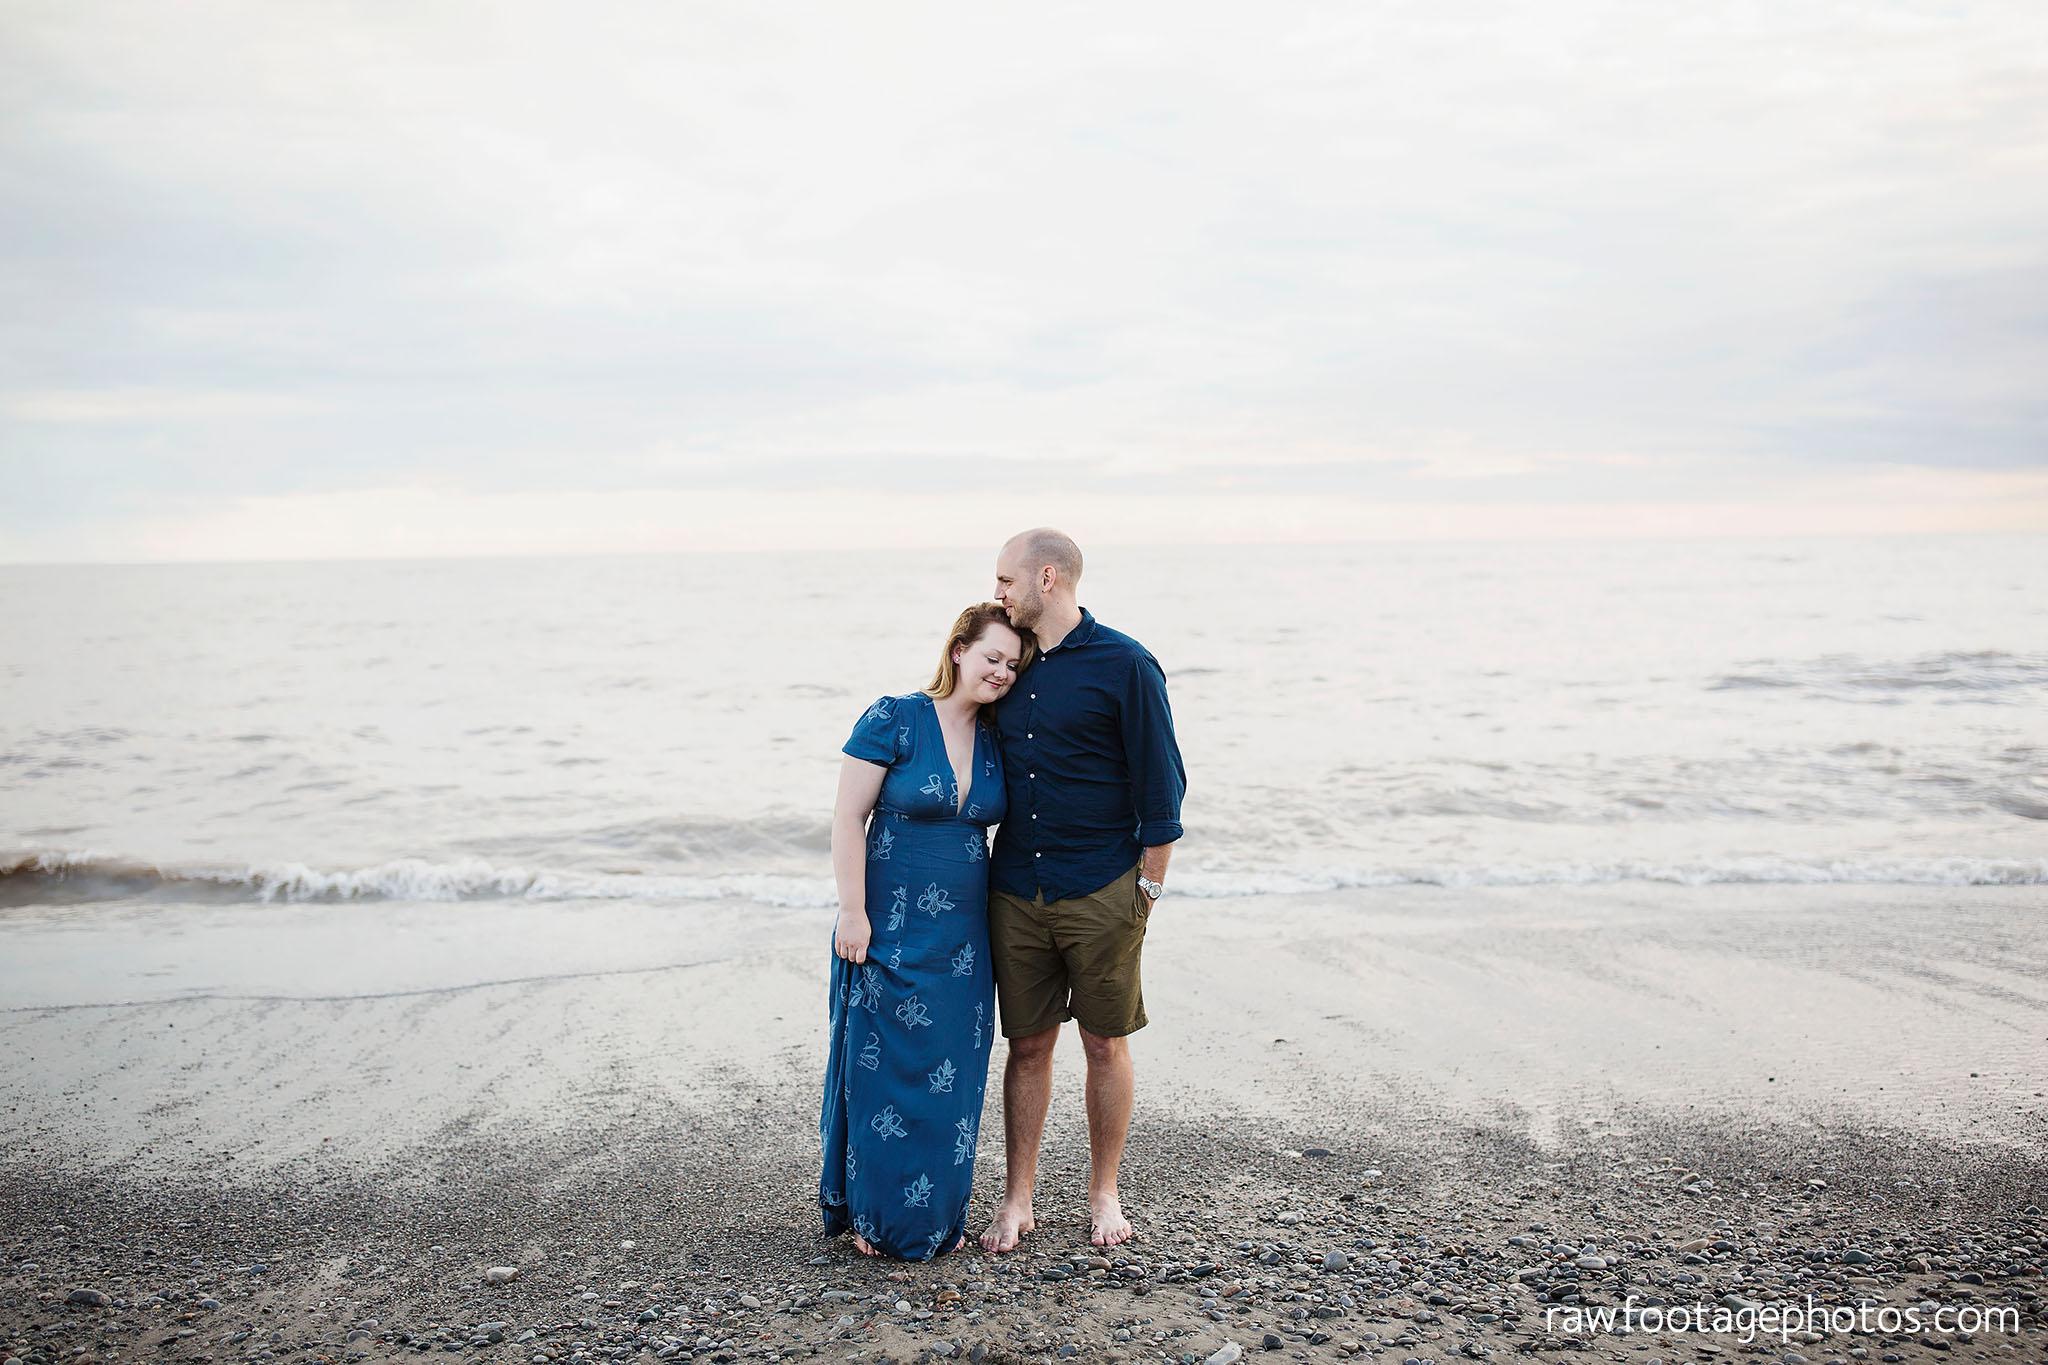 london_ontario_photographer-raw_footage_photography-beach_minis-port_stanley_beach-family_photographer-couple_photographer-lifestyle_photographer064.jpg